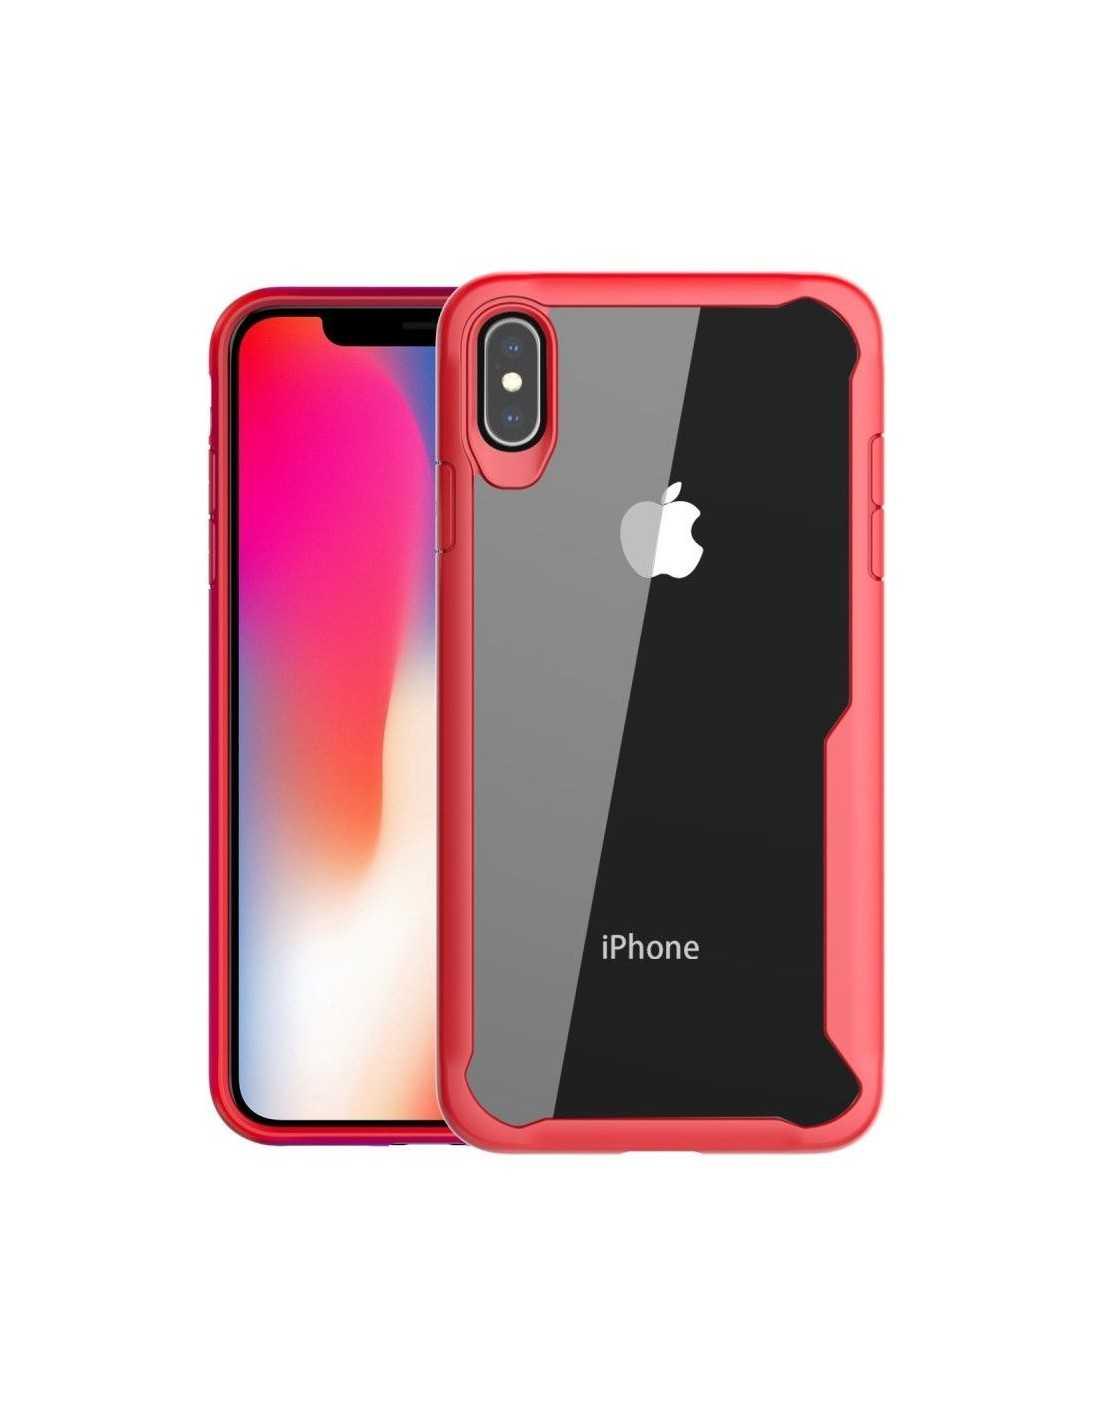 Coque iPhone XS Max Antichoc avec bords renforcés Rouge